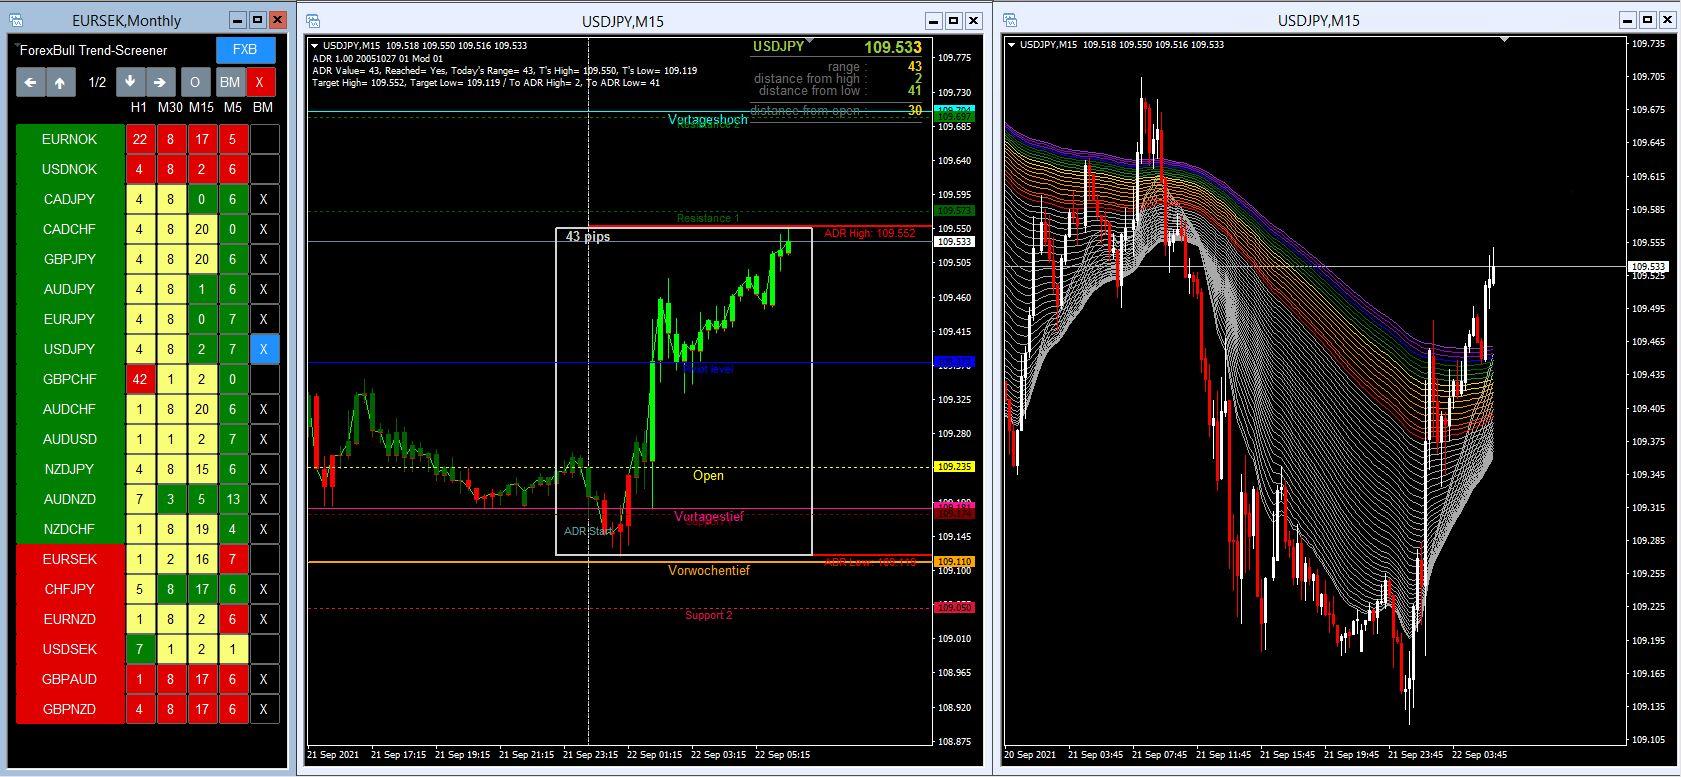 Morning-Briefing-ForexBull-Kuriose-Signallage-Chartanalyse-Marcus-Klebe-GodmodeTrader.de-2